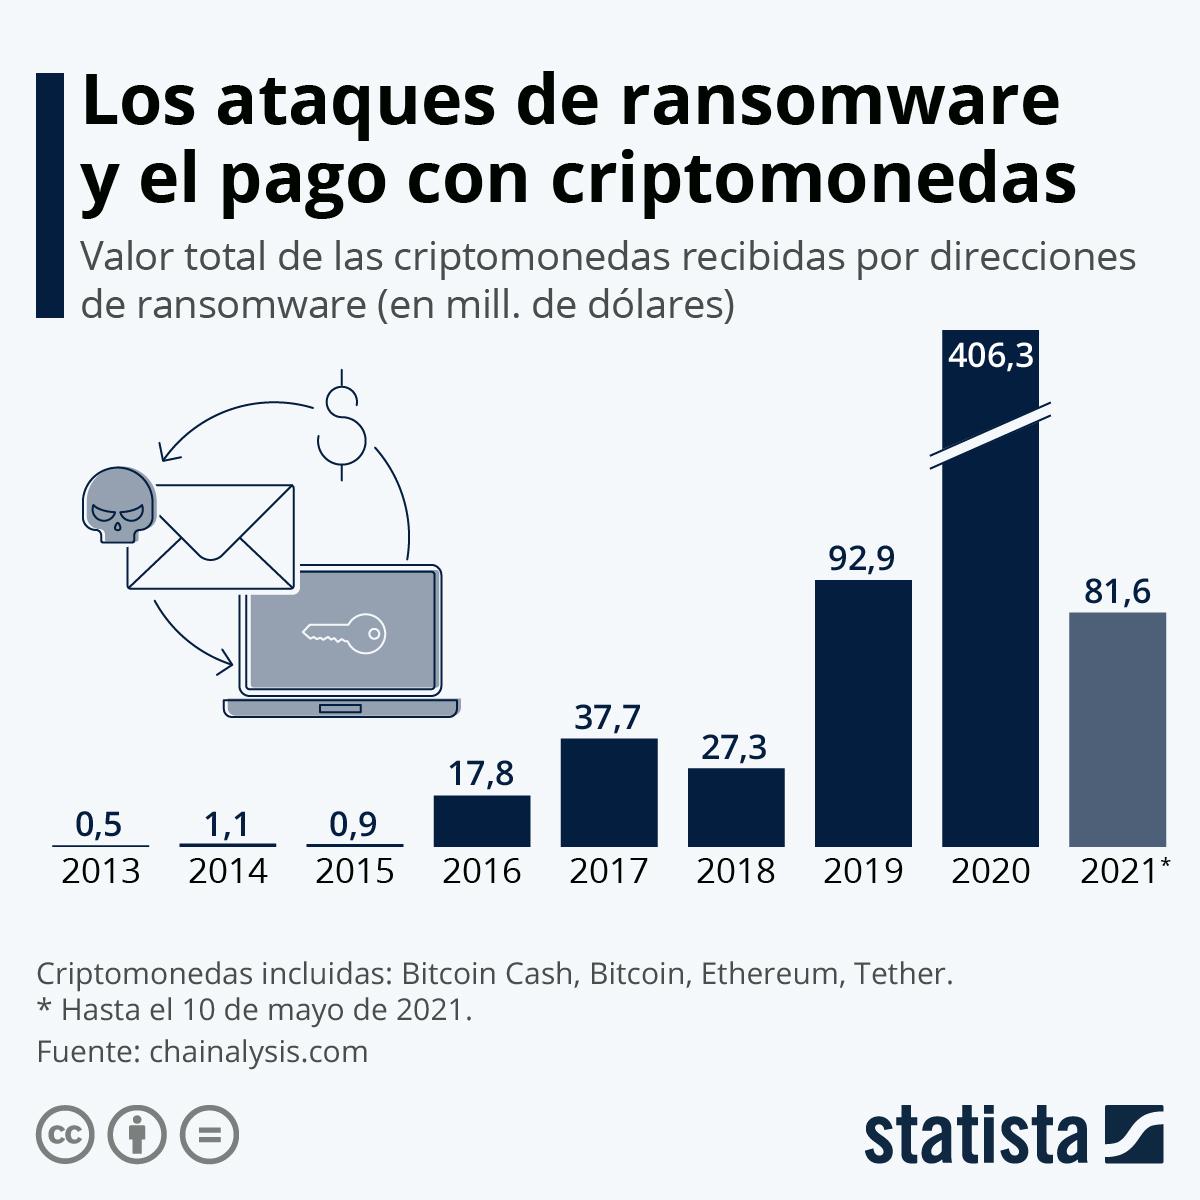 Infografía: Los pagos de rescate con criptomonedas por ataques ransomware se dispararon en 2020 | Statista